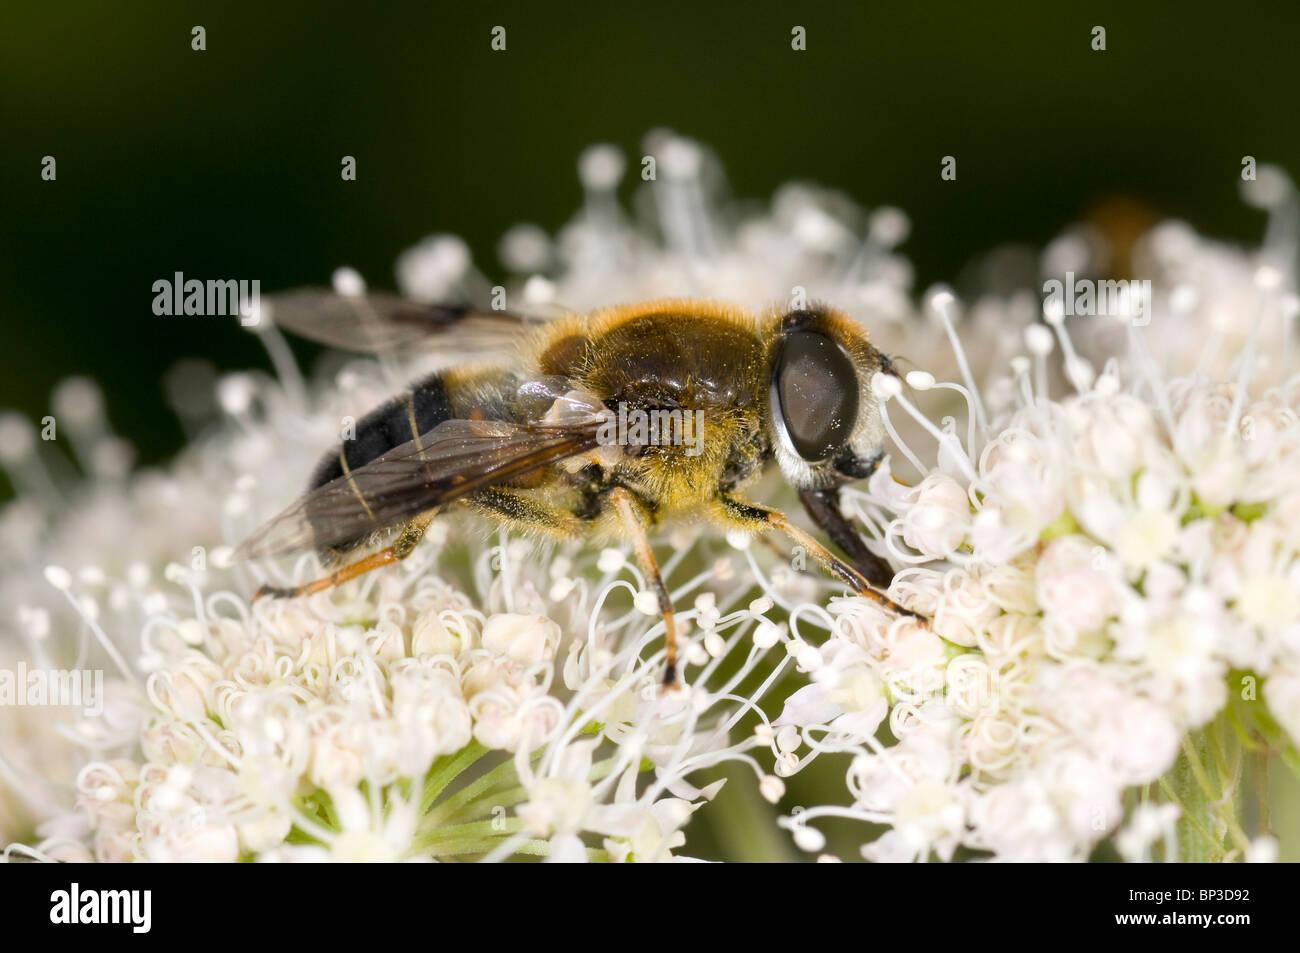 close up of a Hoverfly, Eristalis spp. on meadowsweet flower, (Filipendula ulmaria) feeding on nectar - Stock Image